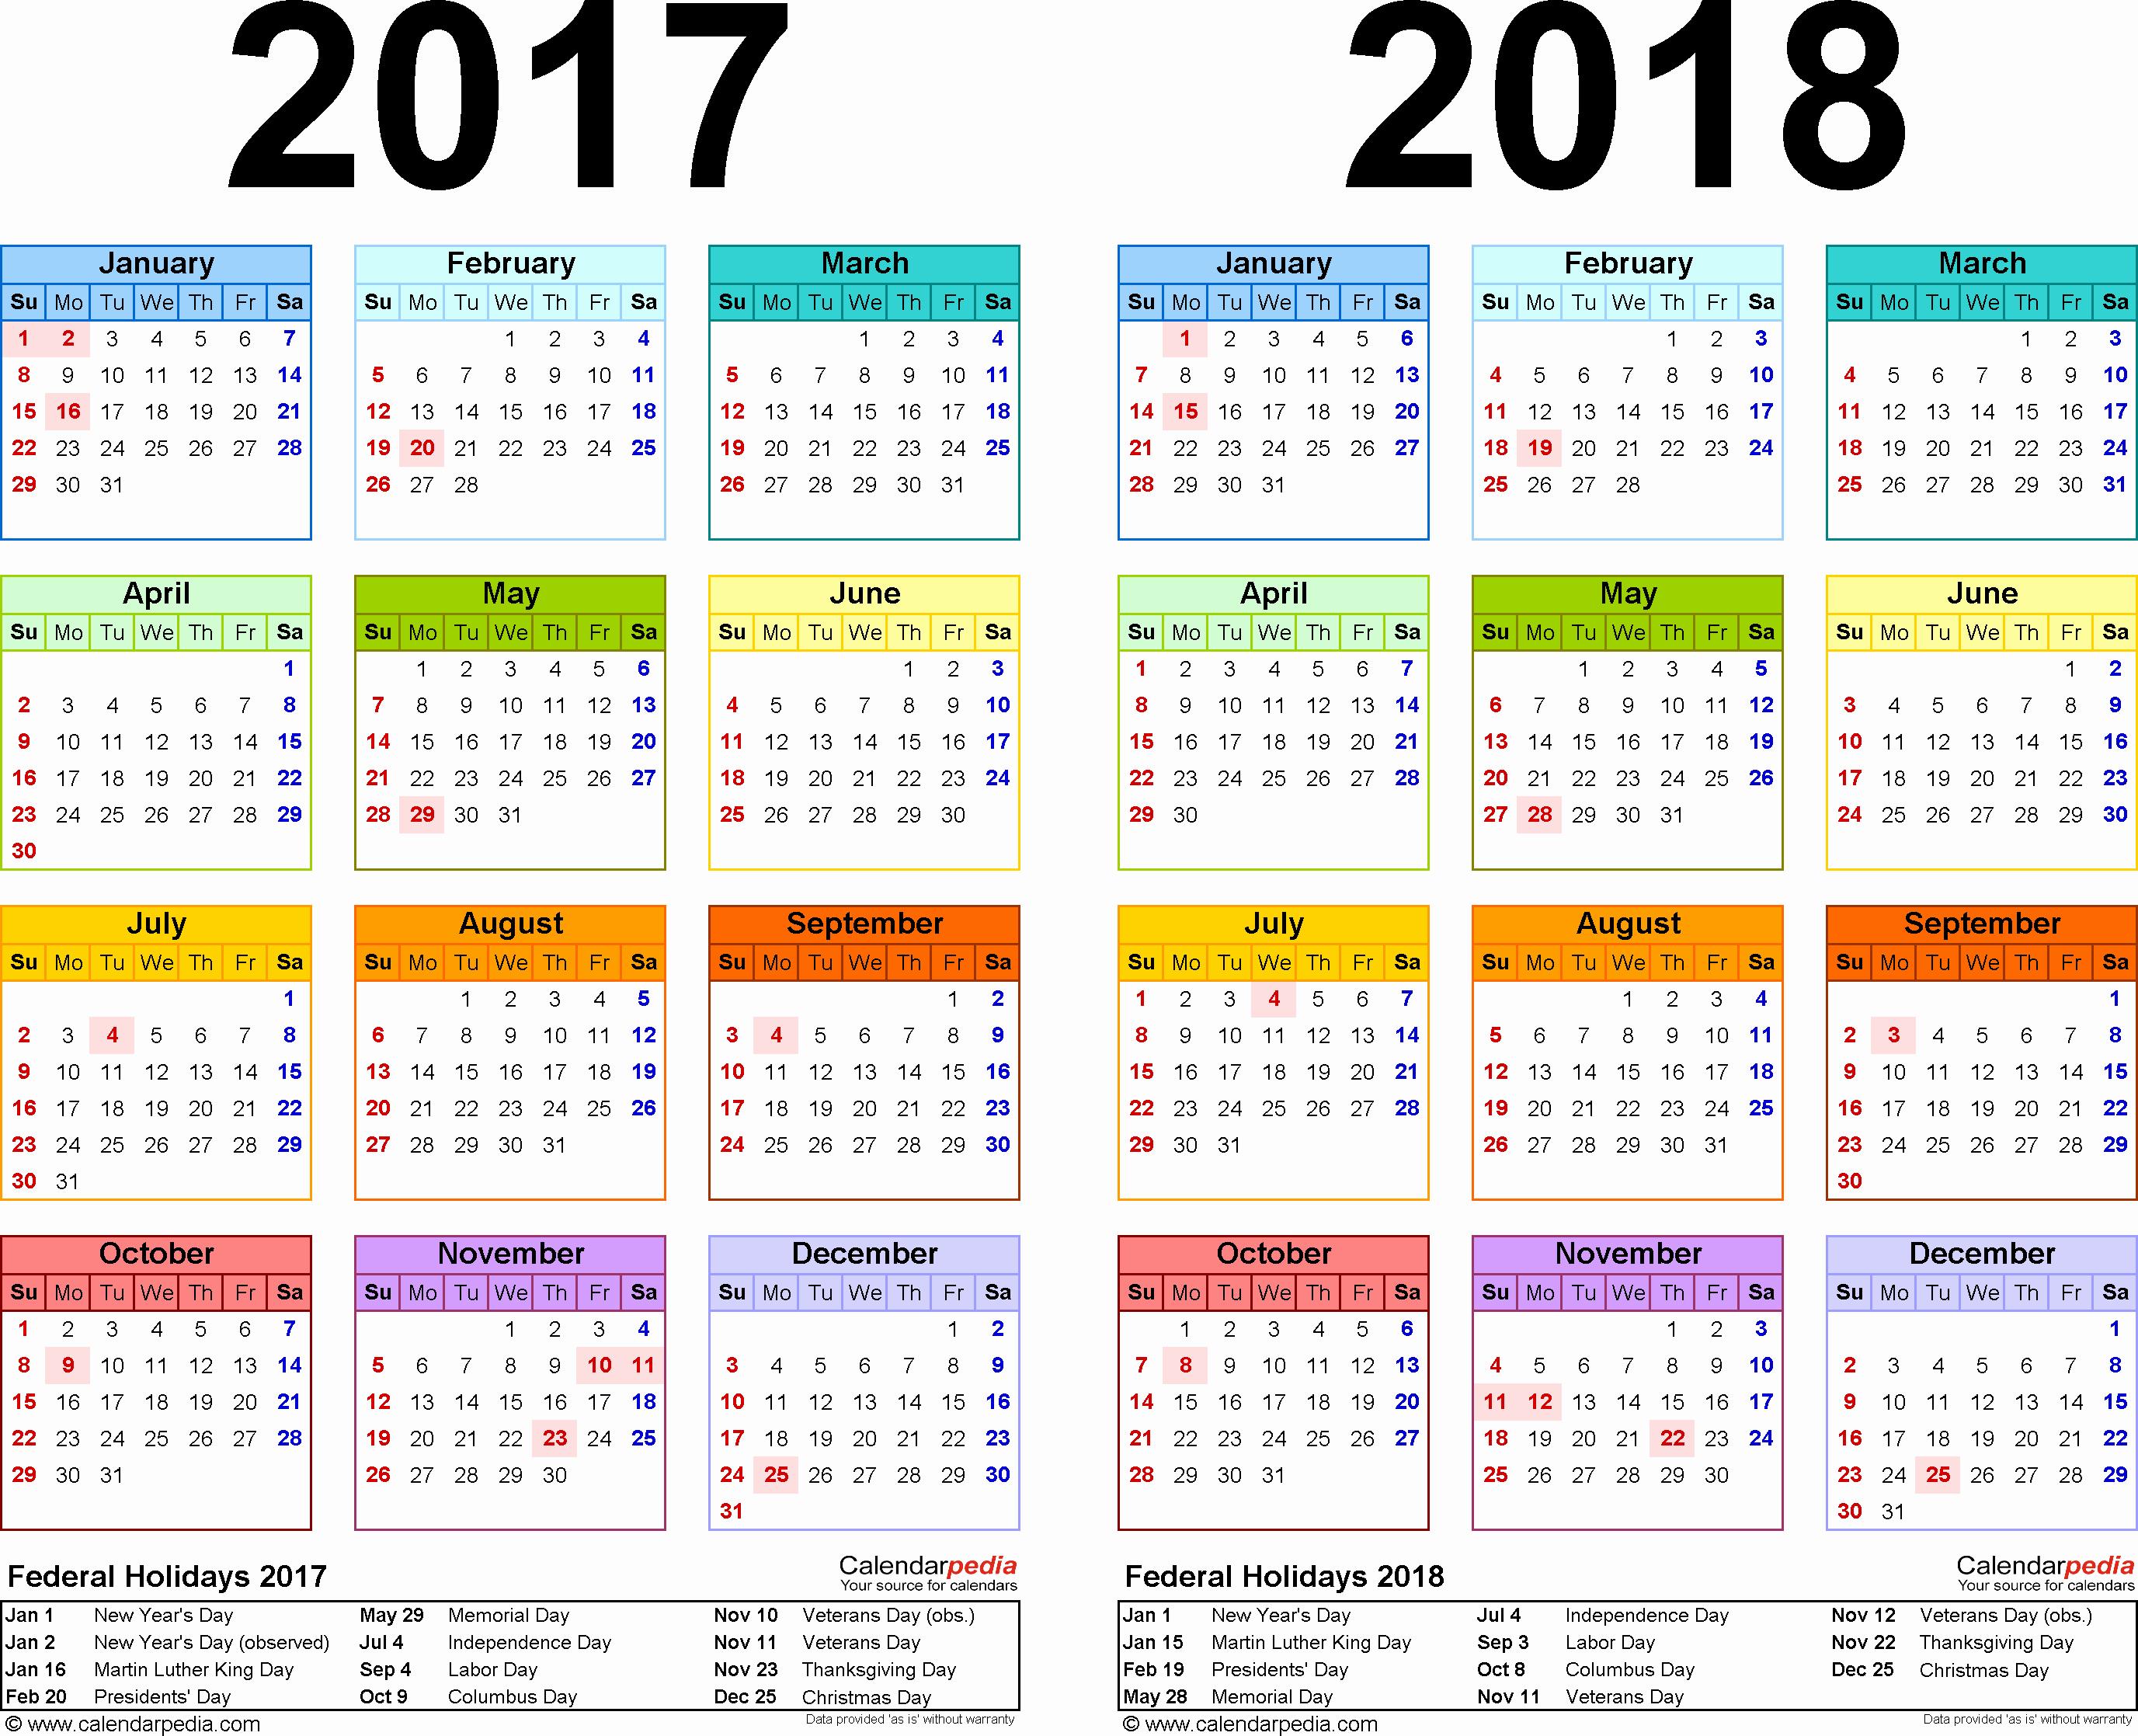 2017-2018 Printable Calendar Elegant 2017 2018 Calendar Free Printable Two Year Word Calendars